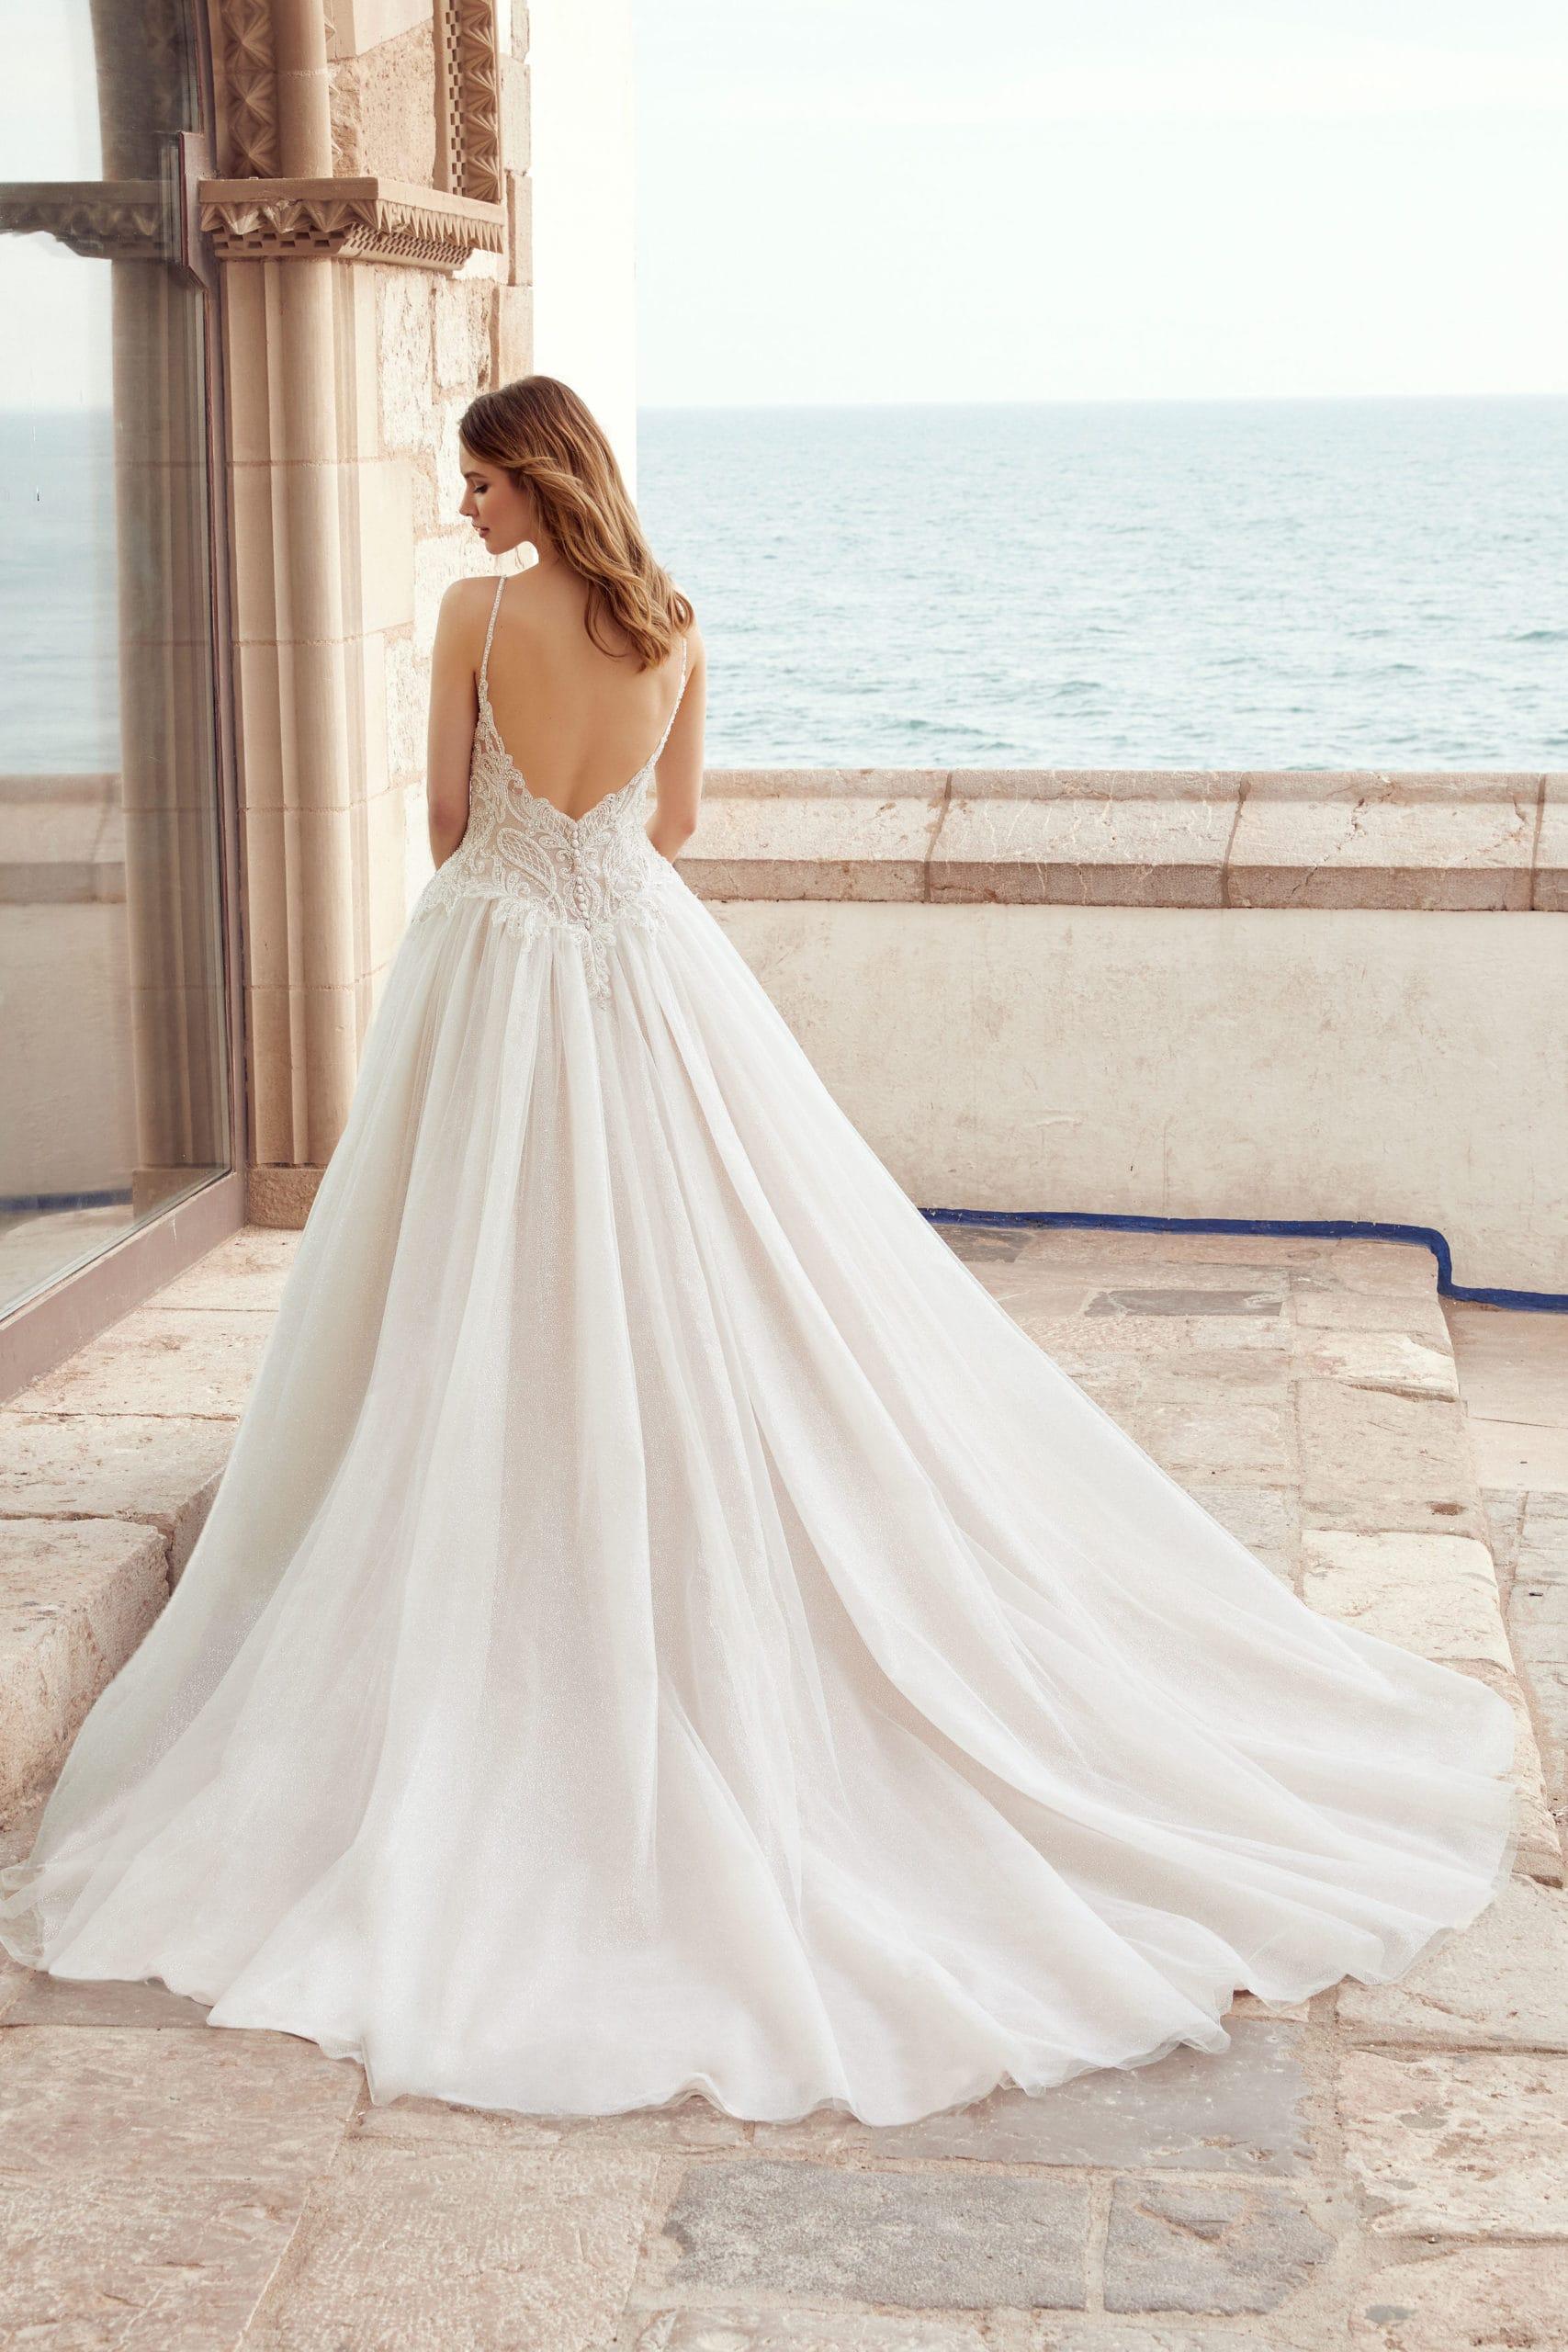 shop for wedding dress